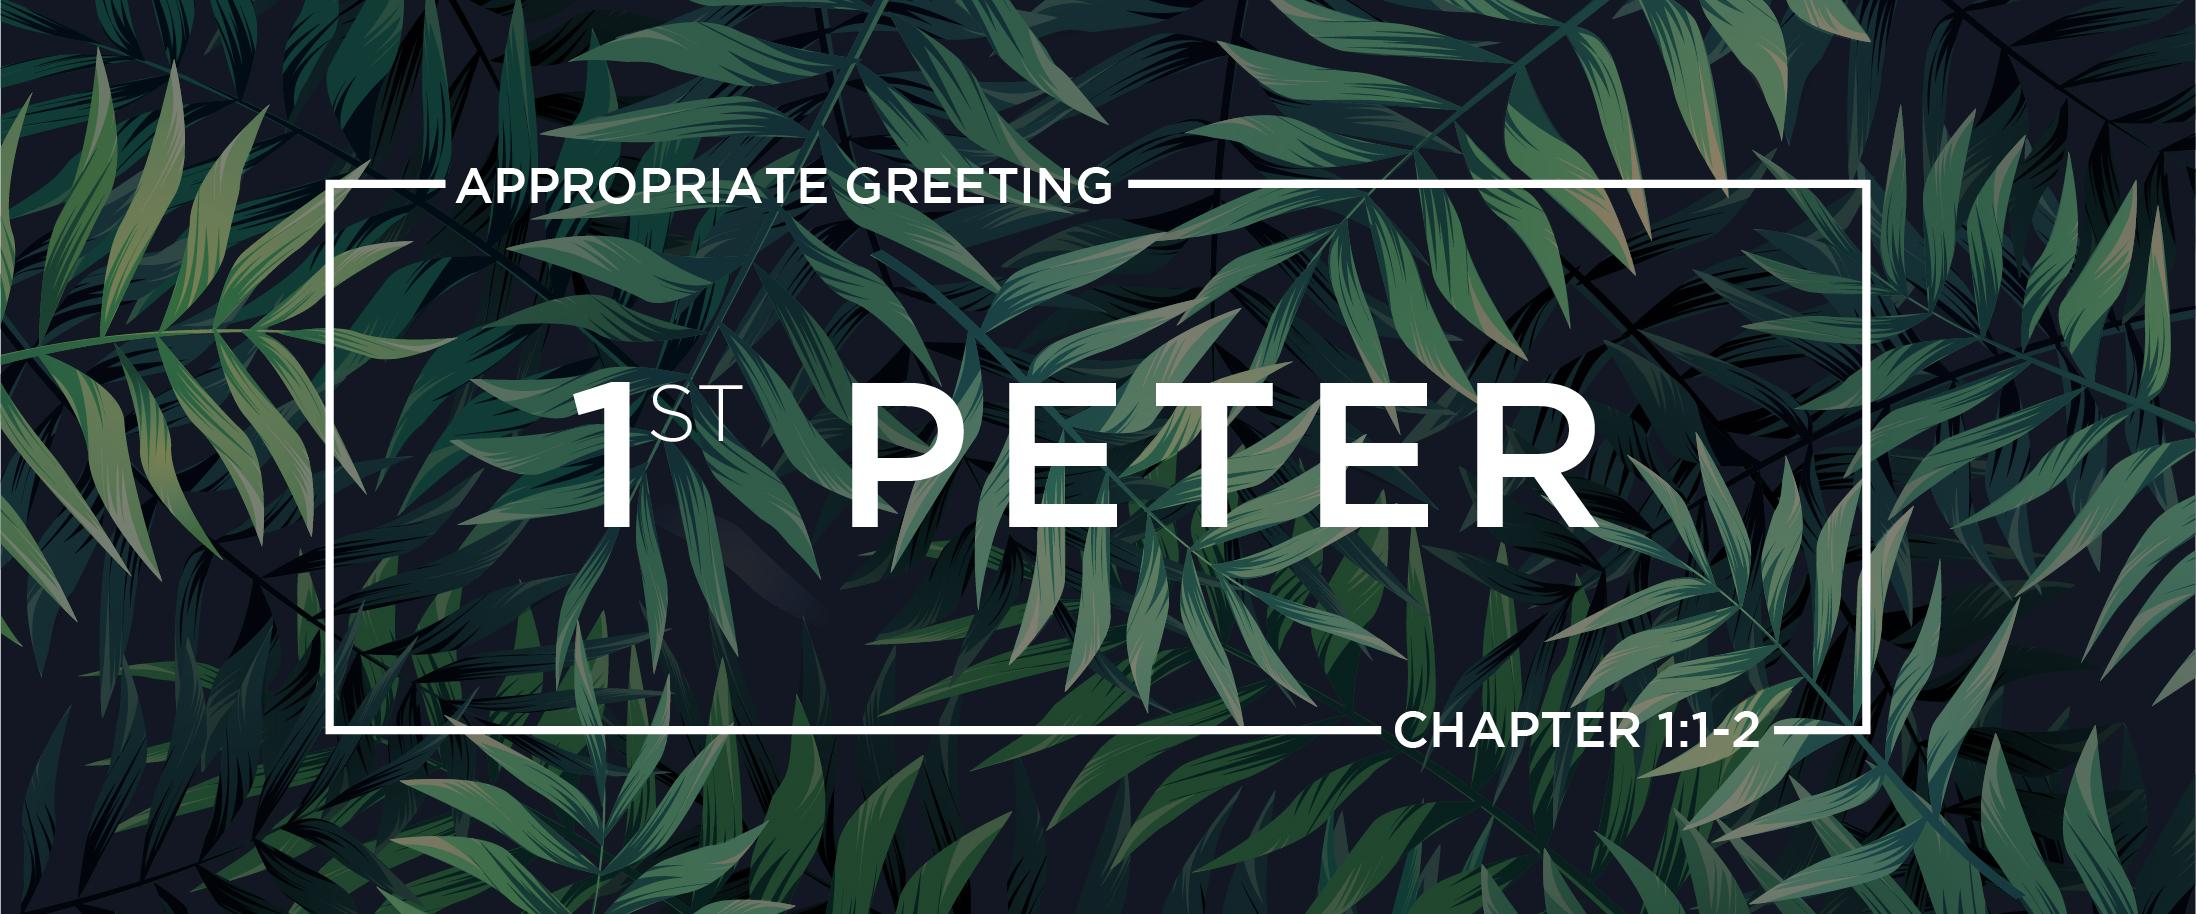 SBC, 1 Peter, Message-01.jpg